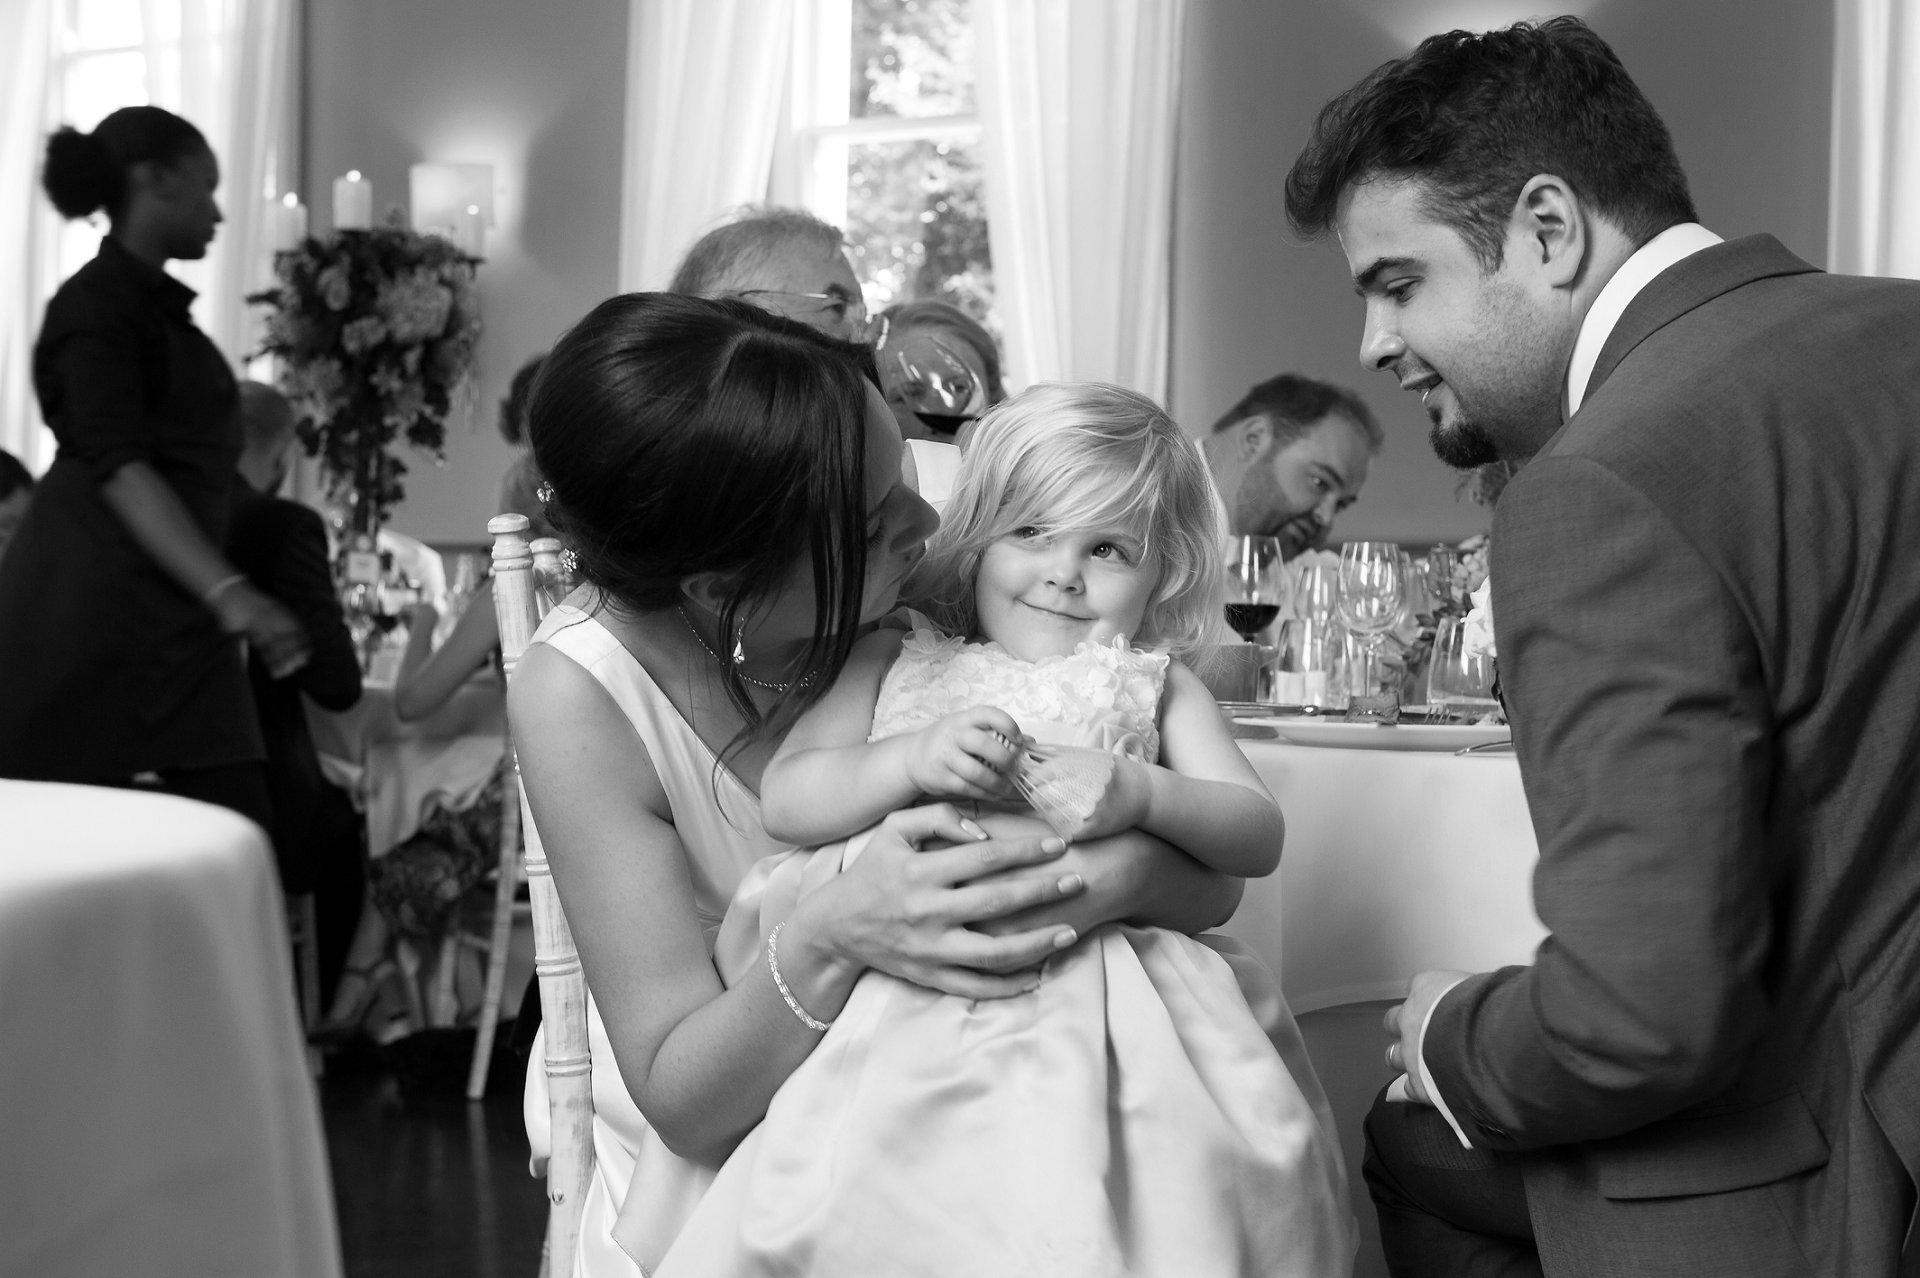 Flower girl eyes up the wedding cake